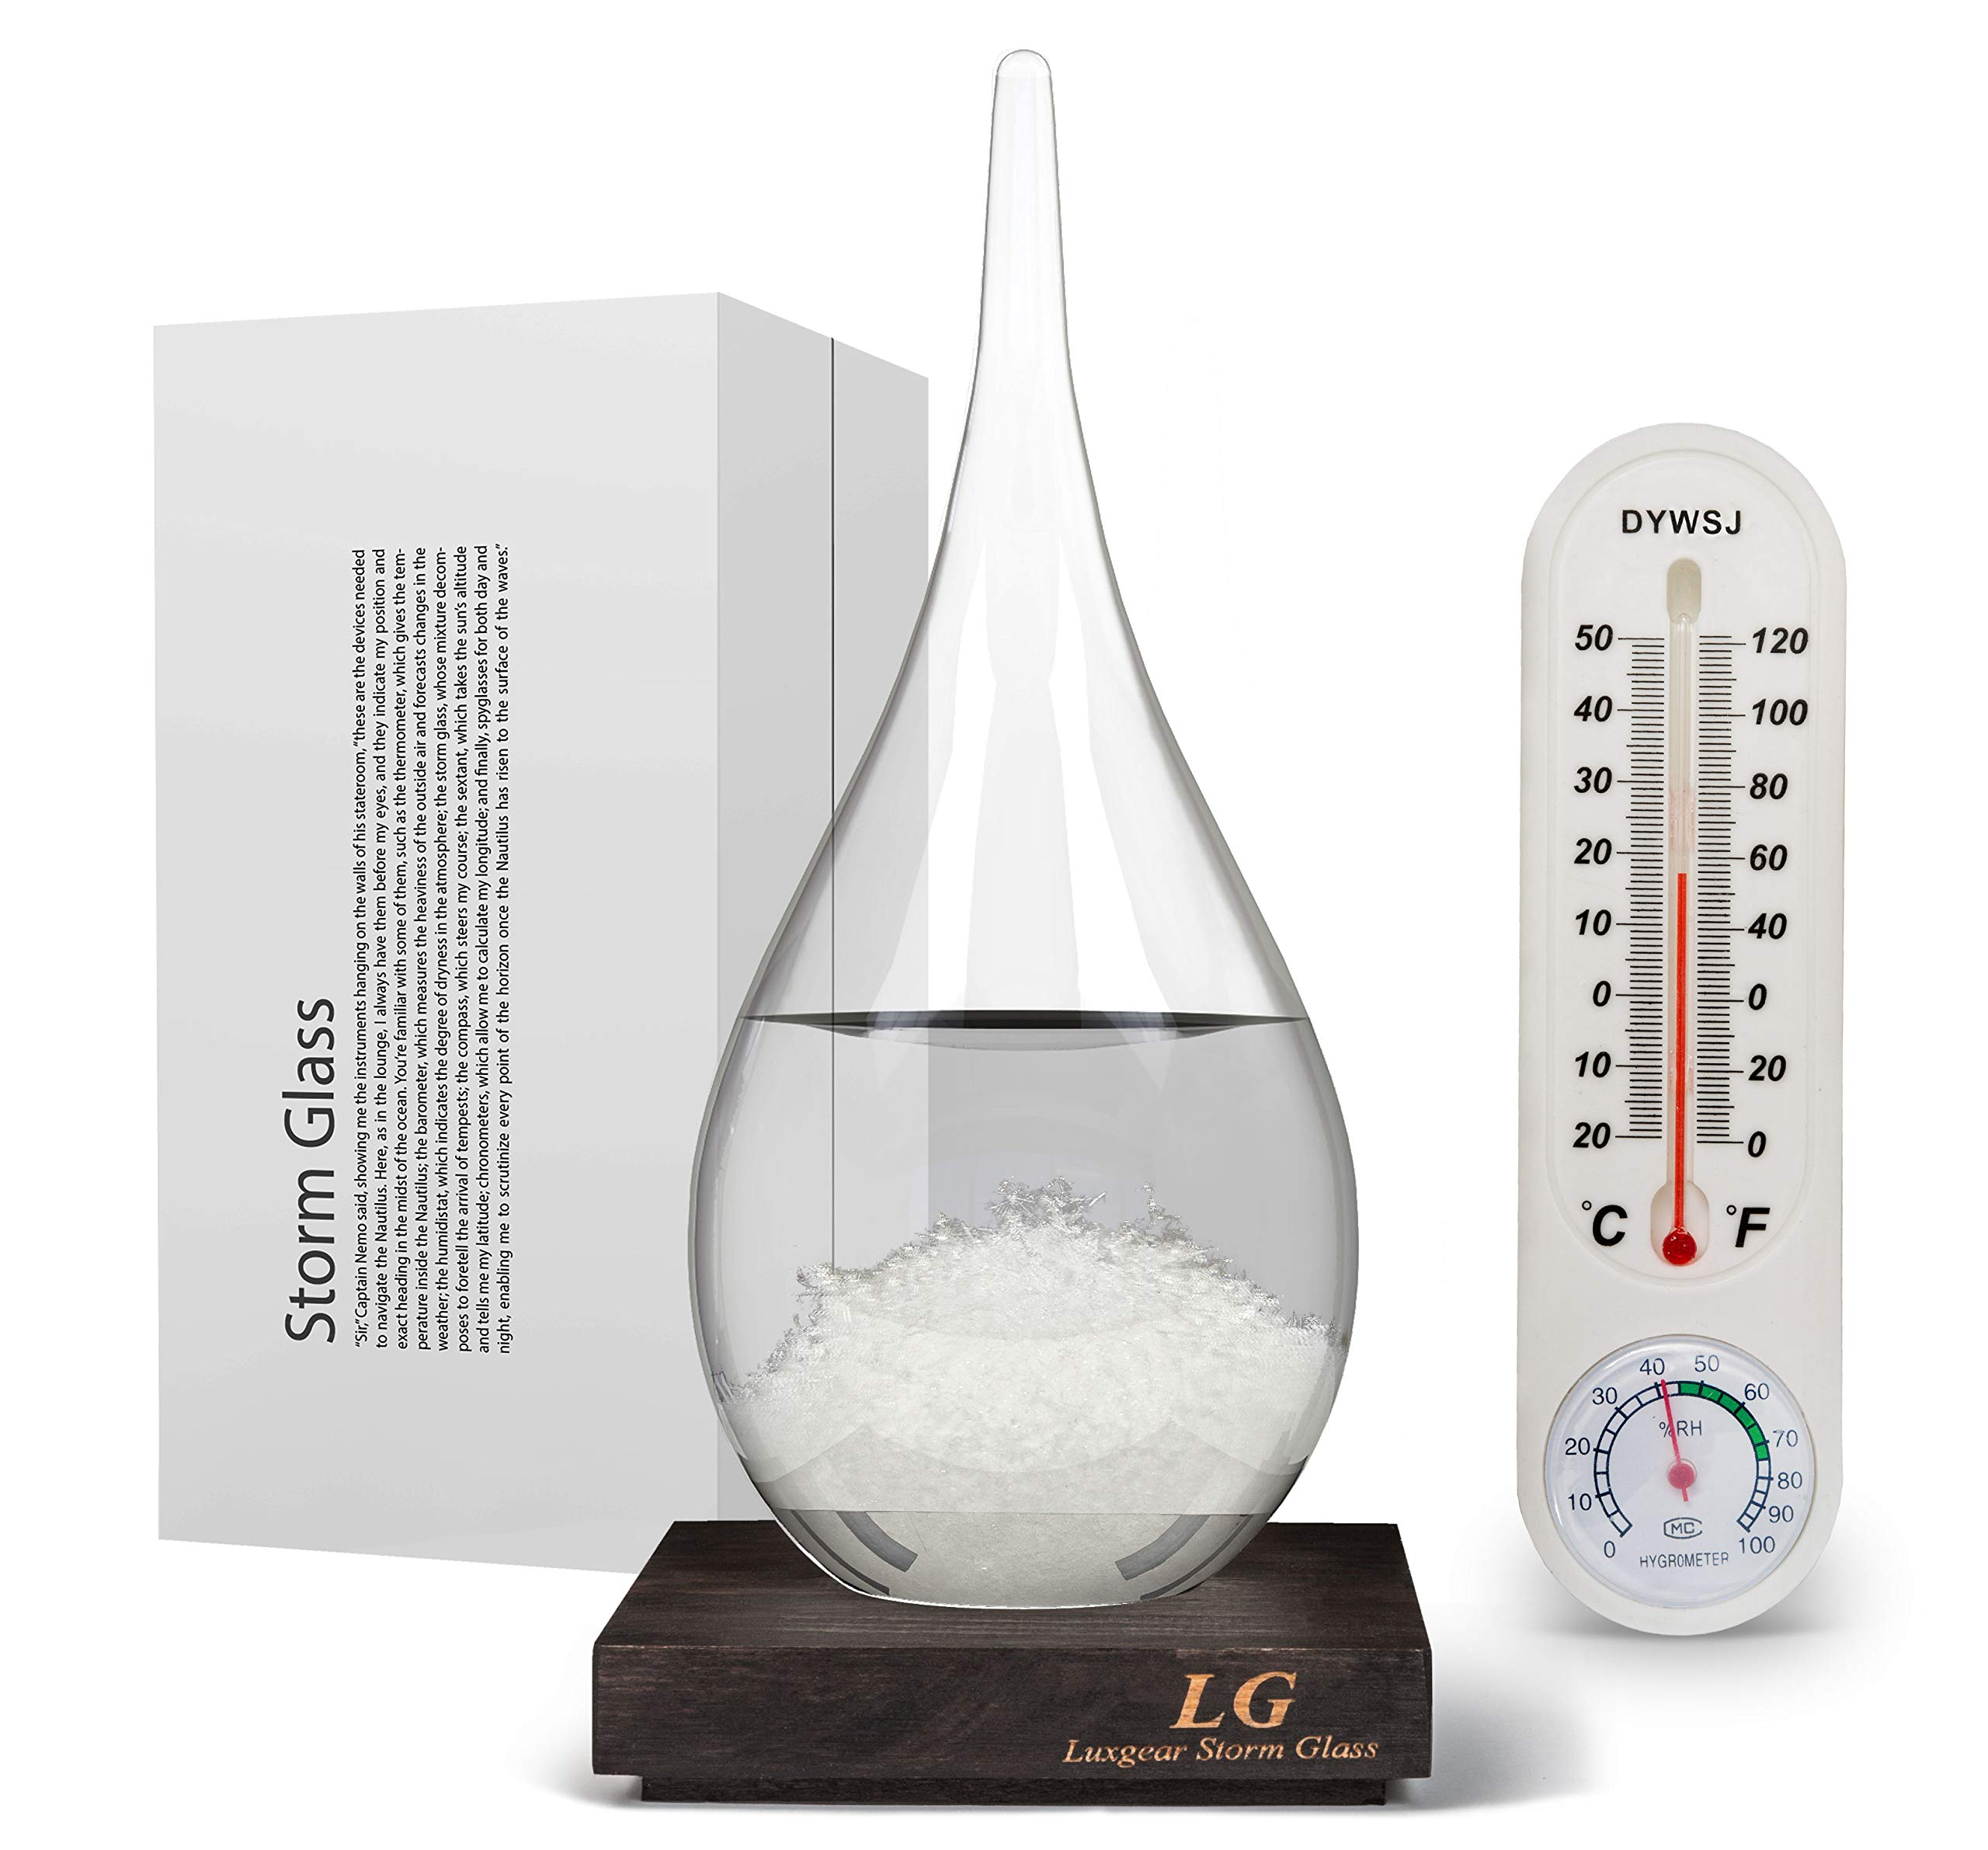 Storm Glass XL Bundle - 10 Inch Weather Predictor - Large StormTrack Forecast Crystal - Stylish Meteorological Glassware - Extra Large Stormglass Forecaster & Barometer - Teardrop Shape